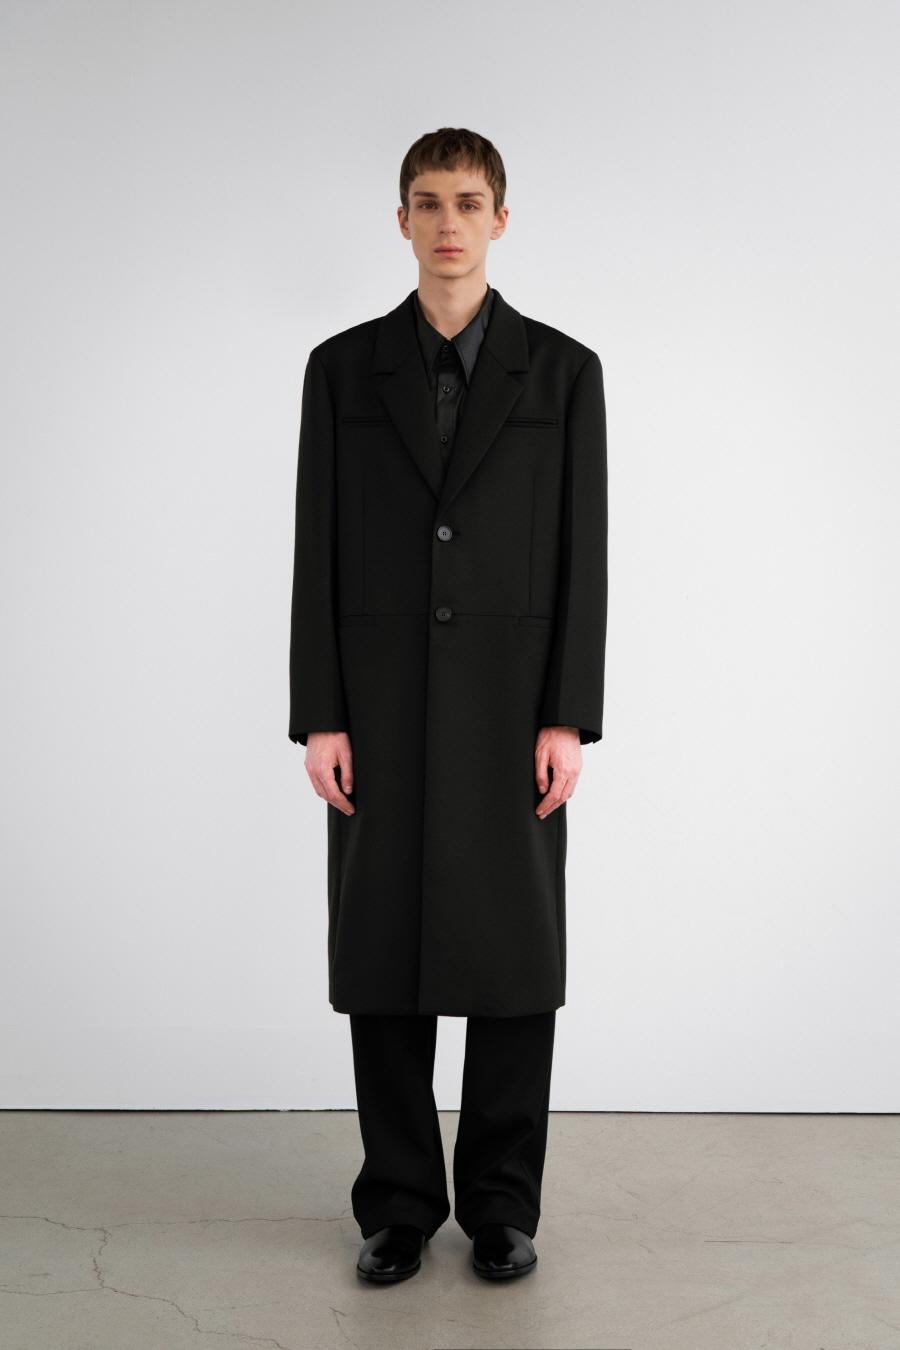 MIROGLIO 미니멀 싱글 코트 BLACK